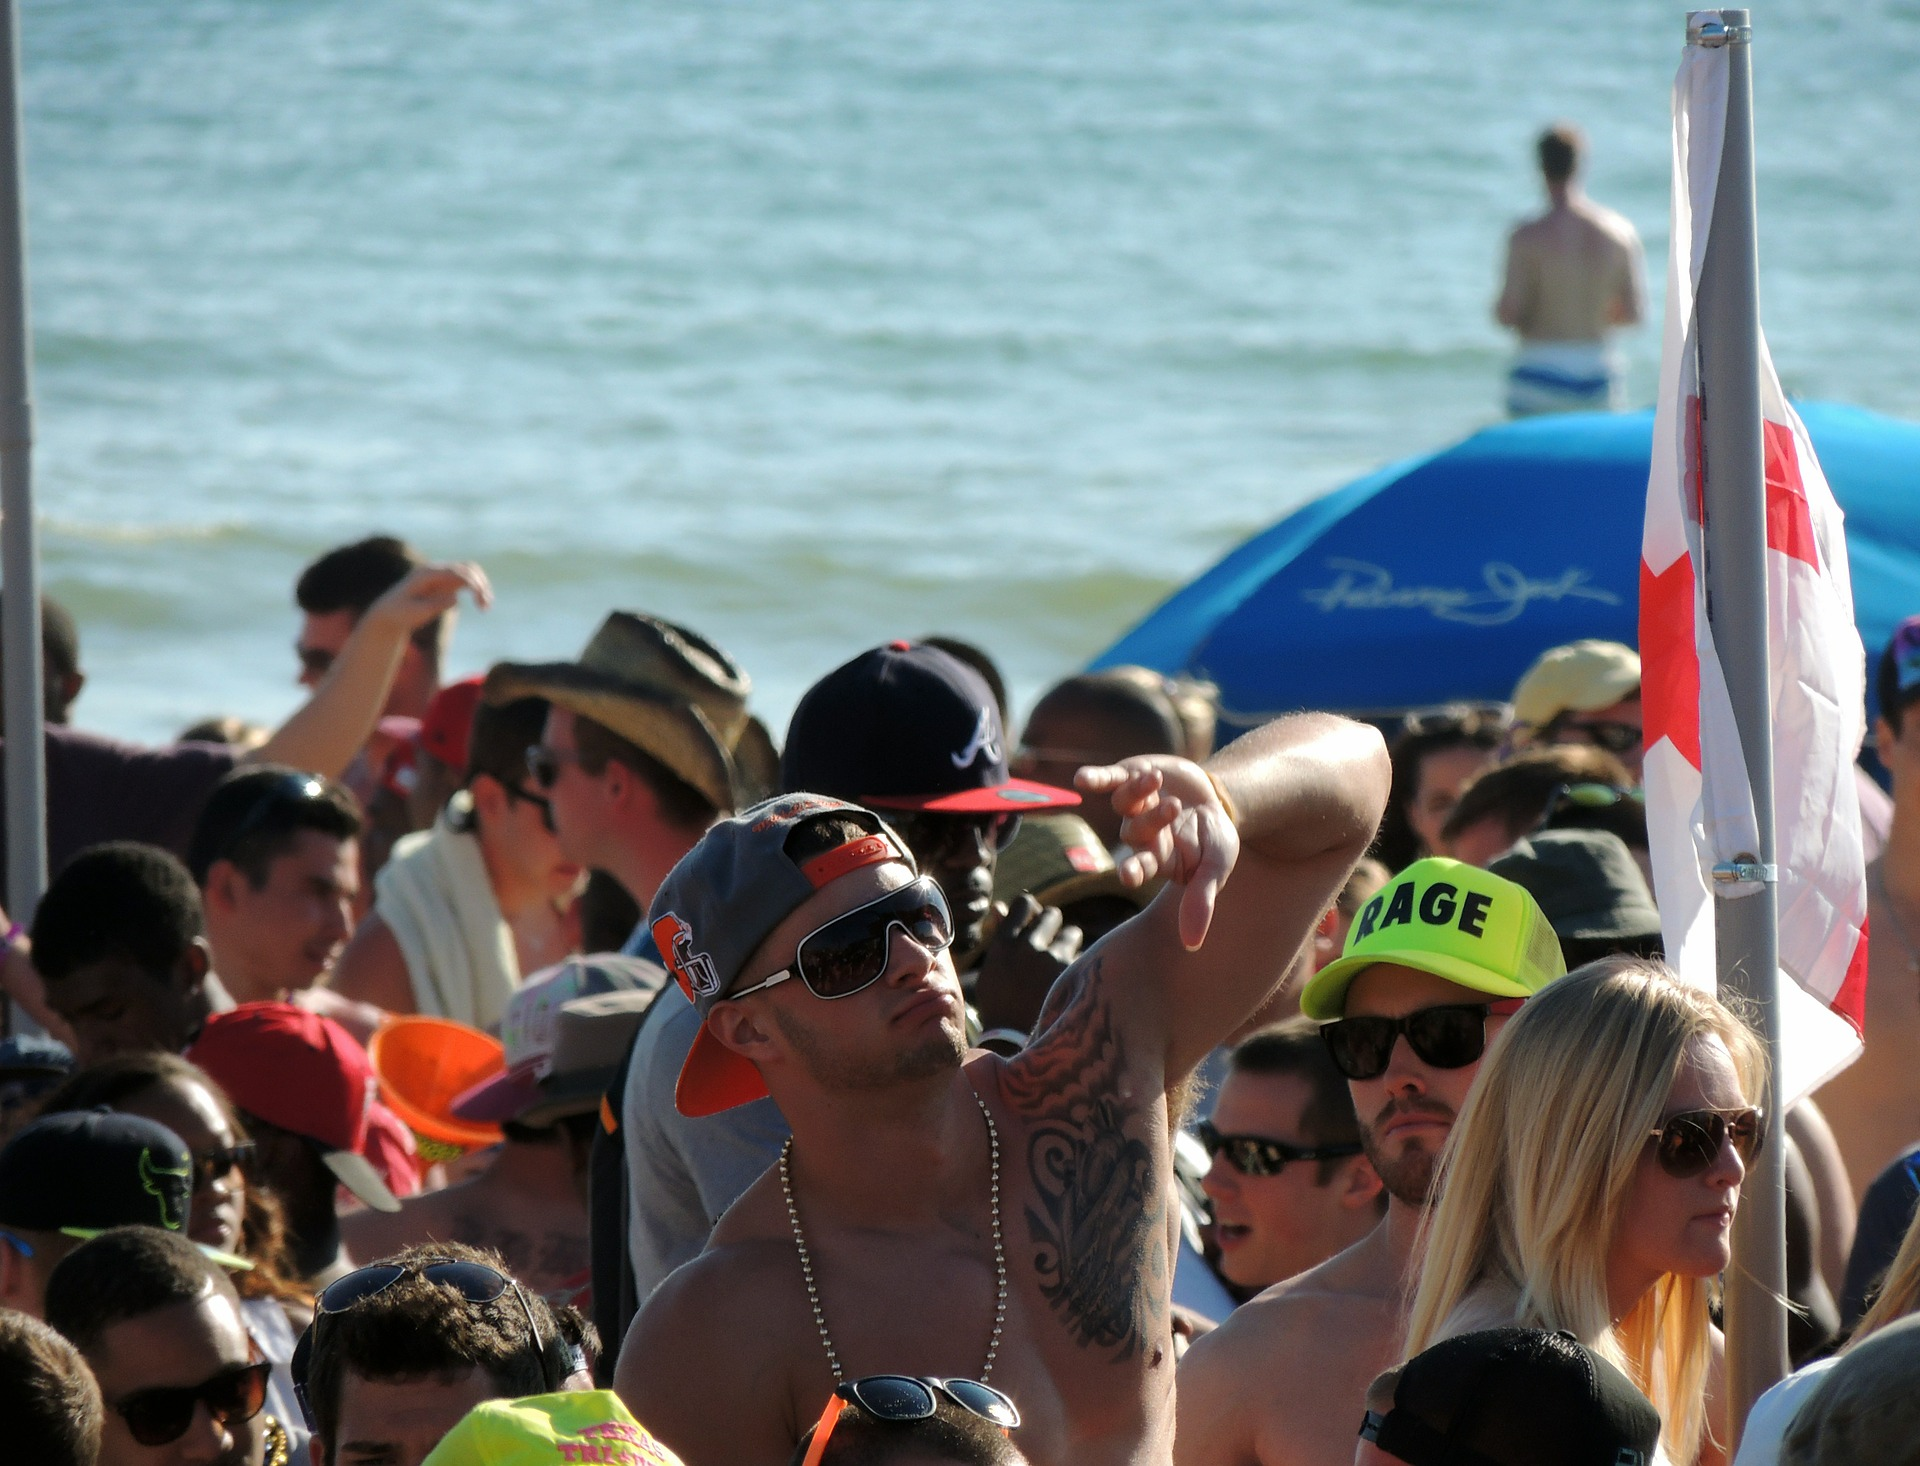 beach-party-583585_1920